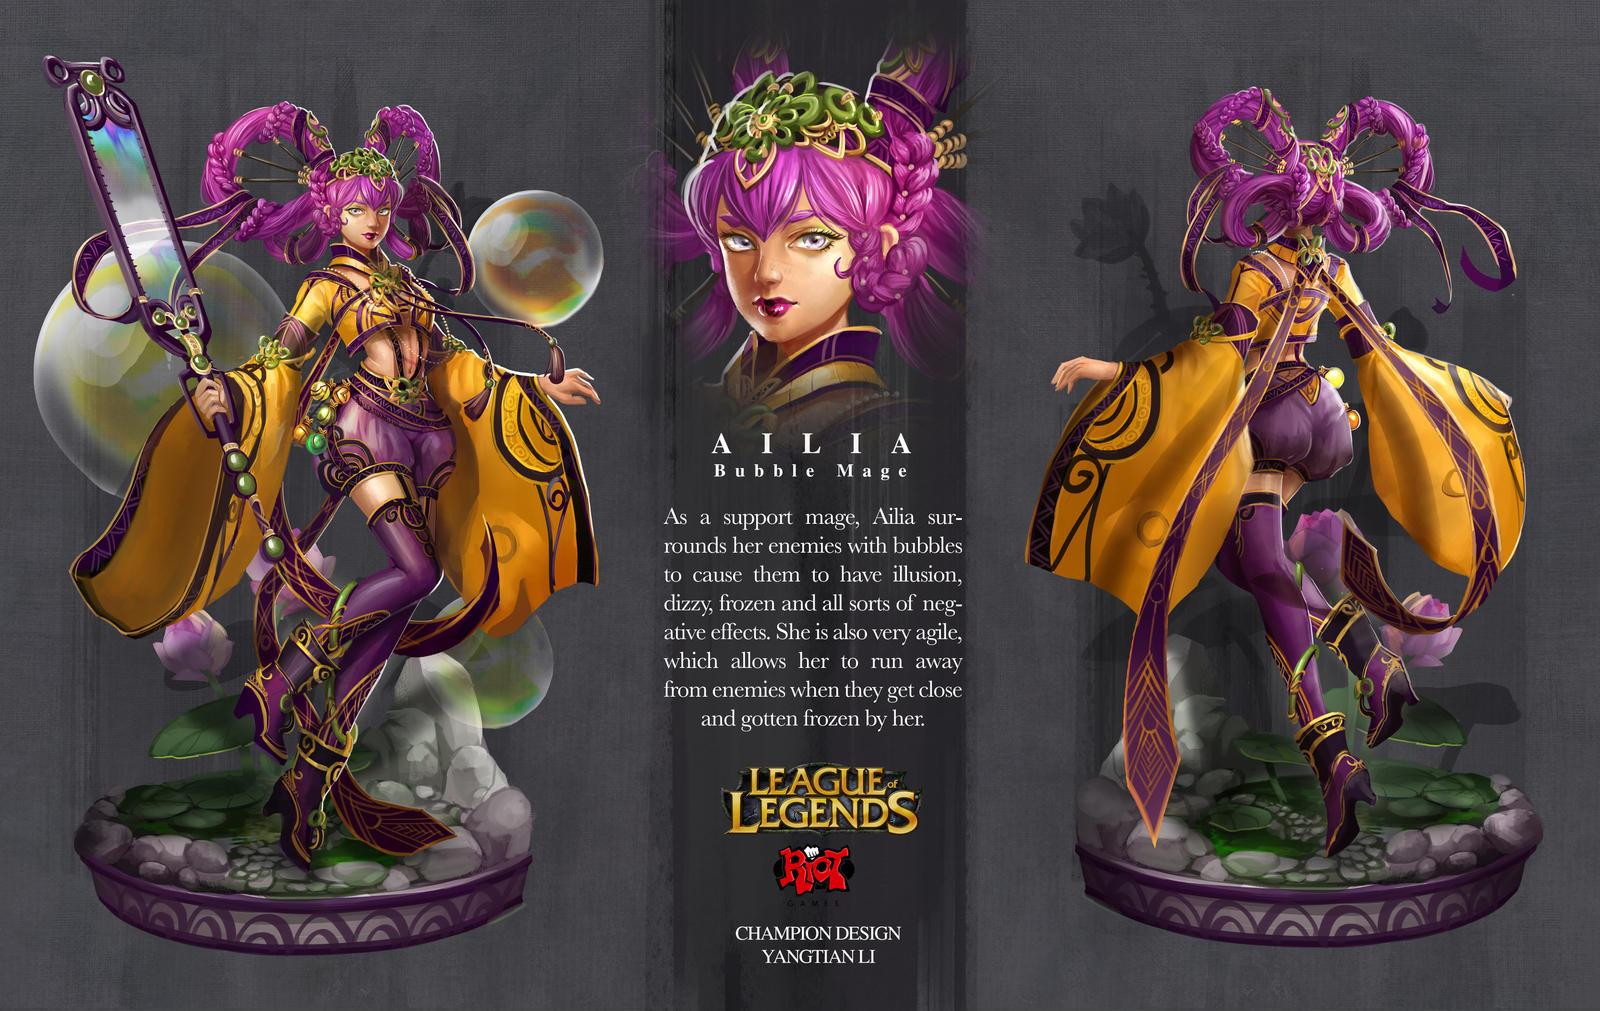 League Of Legends Character Design Contest : Lol champion design by yangtianli on deviantart